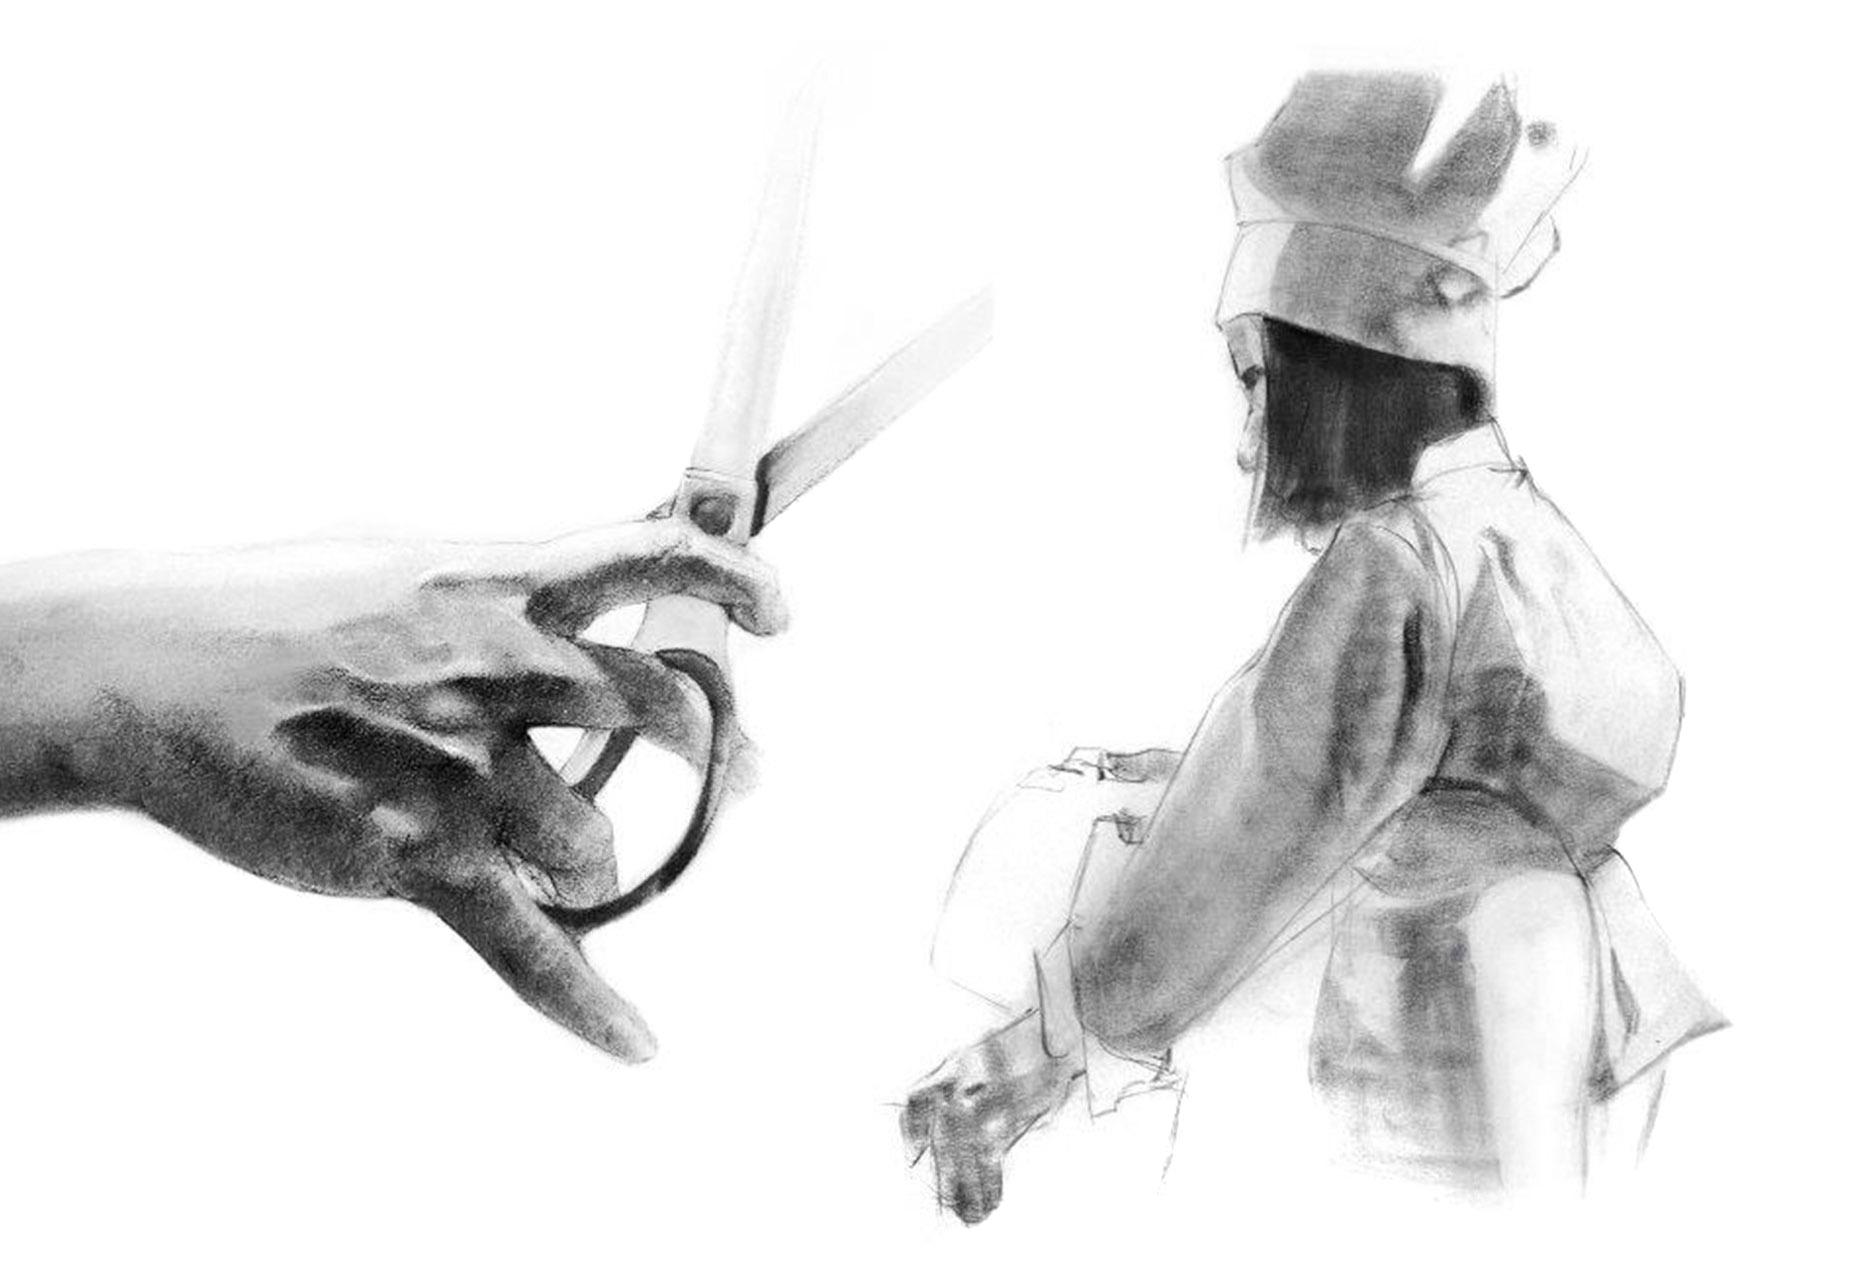 Hand_Sketch.jpg